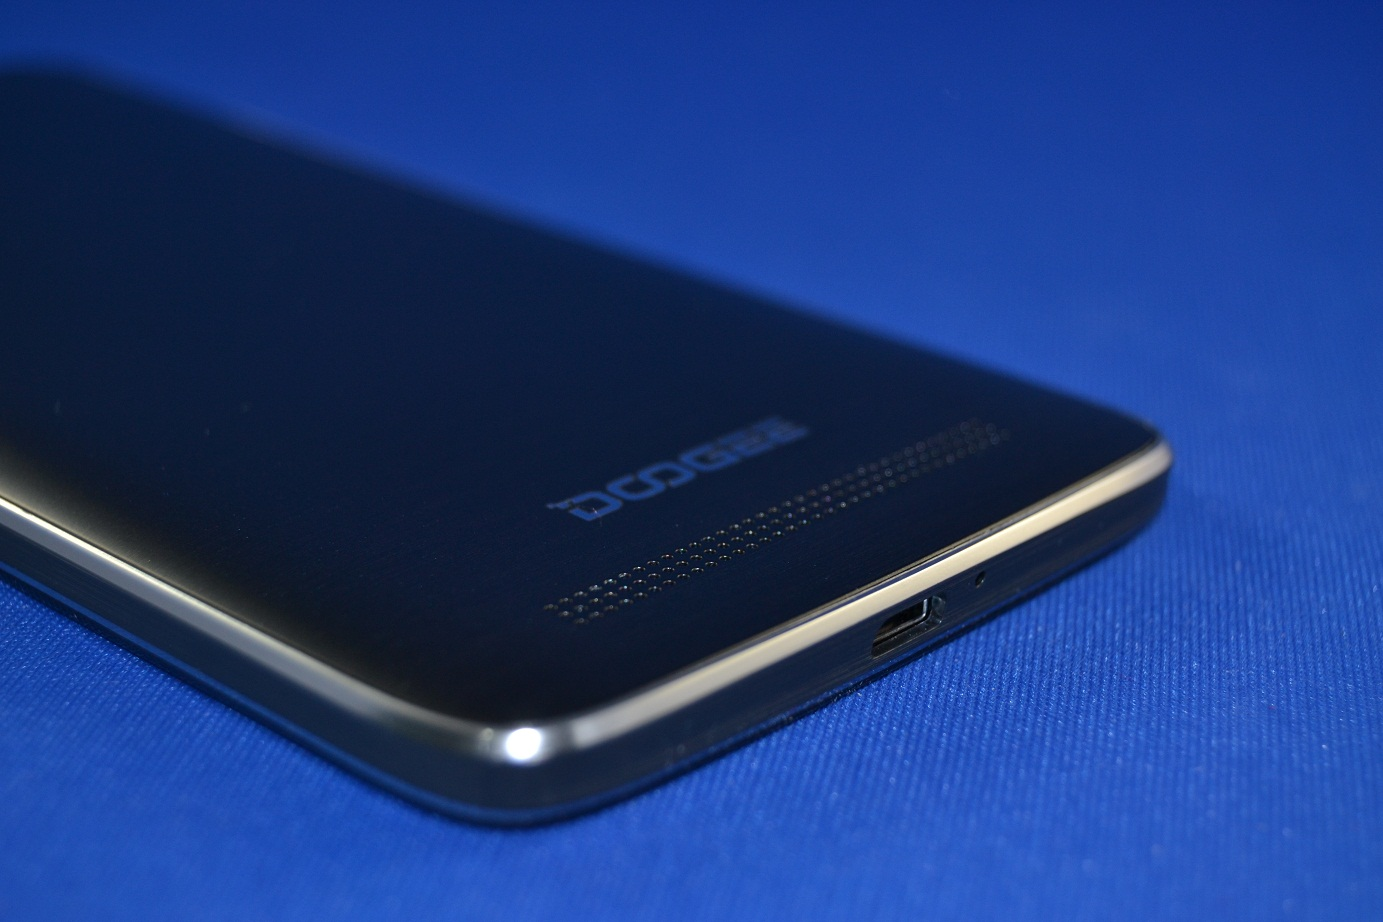 DSC_0189 Cateva pareri despre telefoanele Doogee si un sondaj! Aveti incredere in brandurile din CHINA?